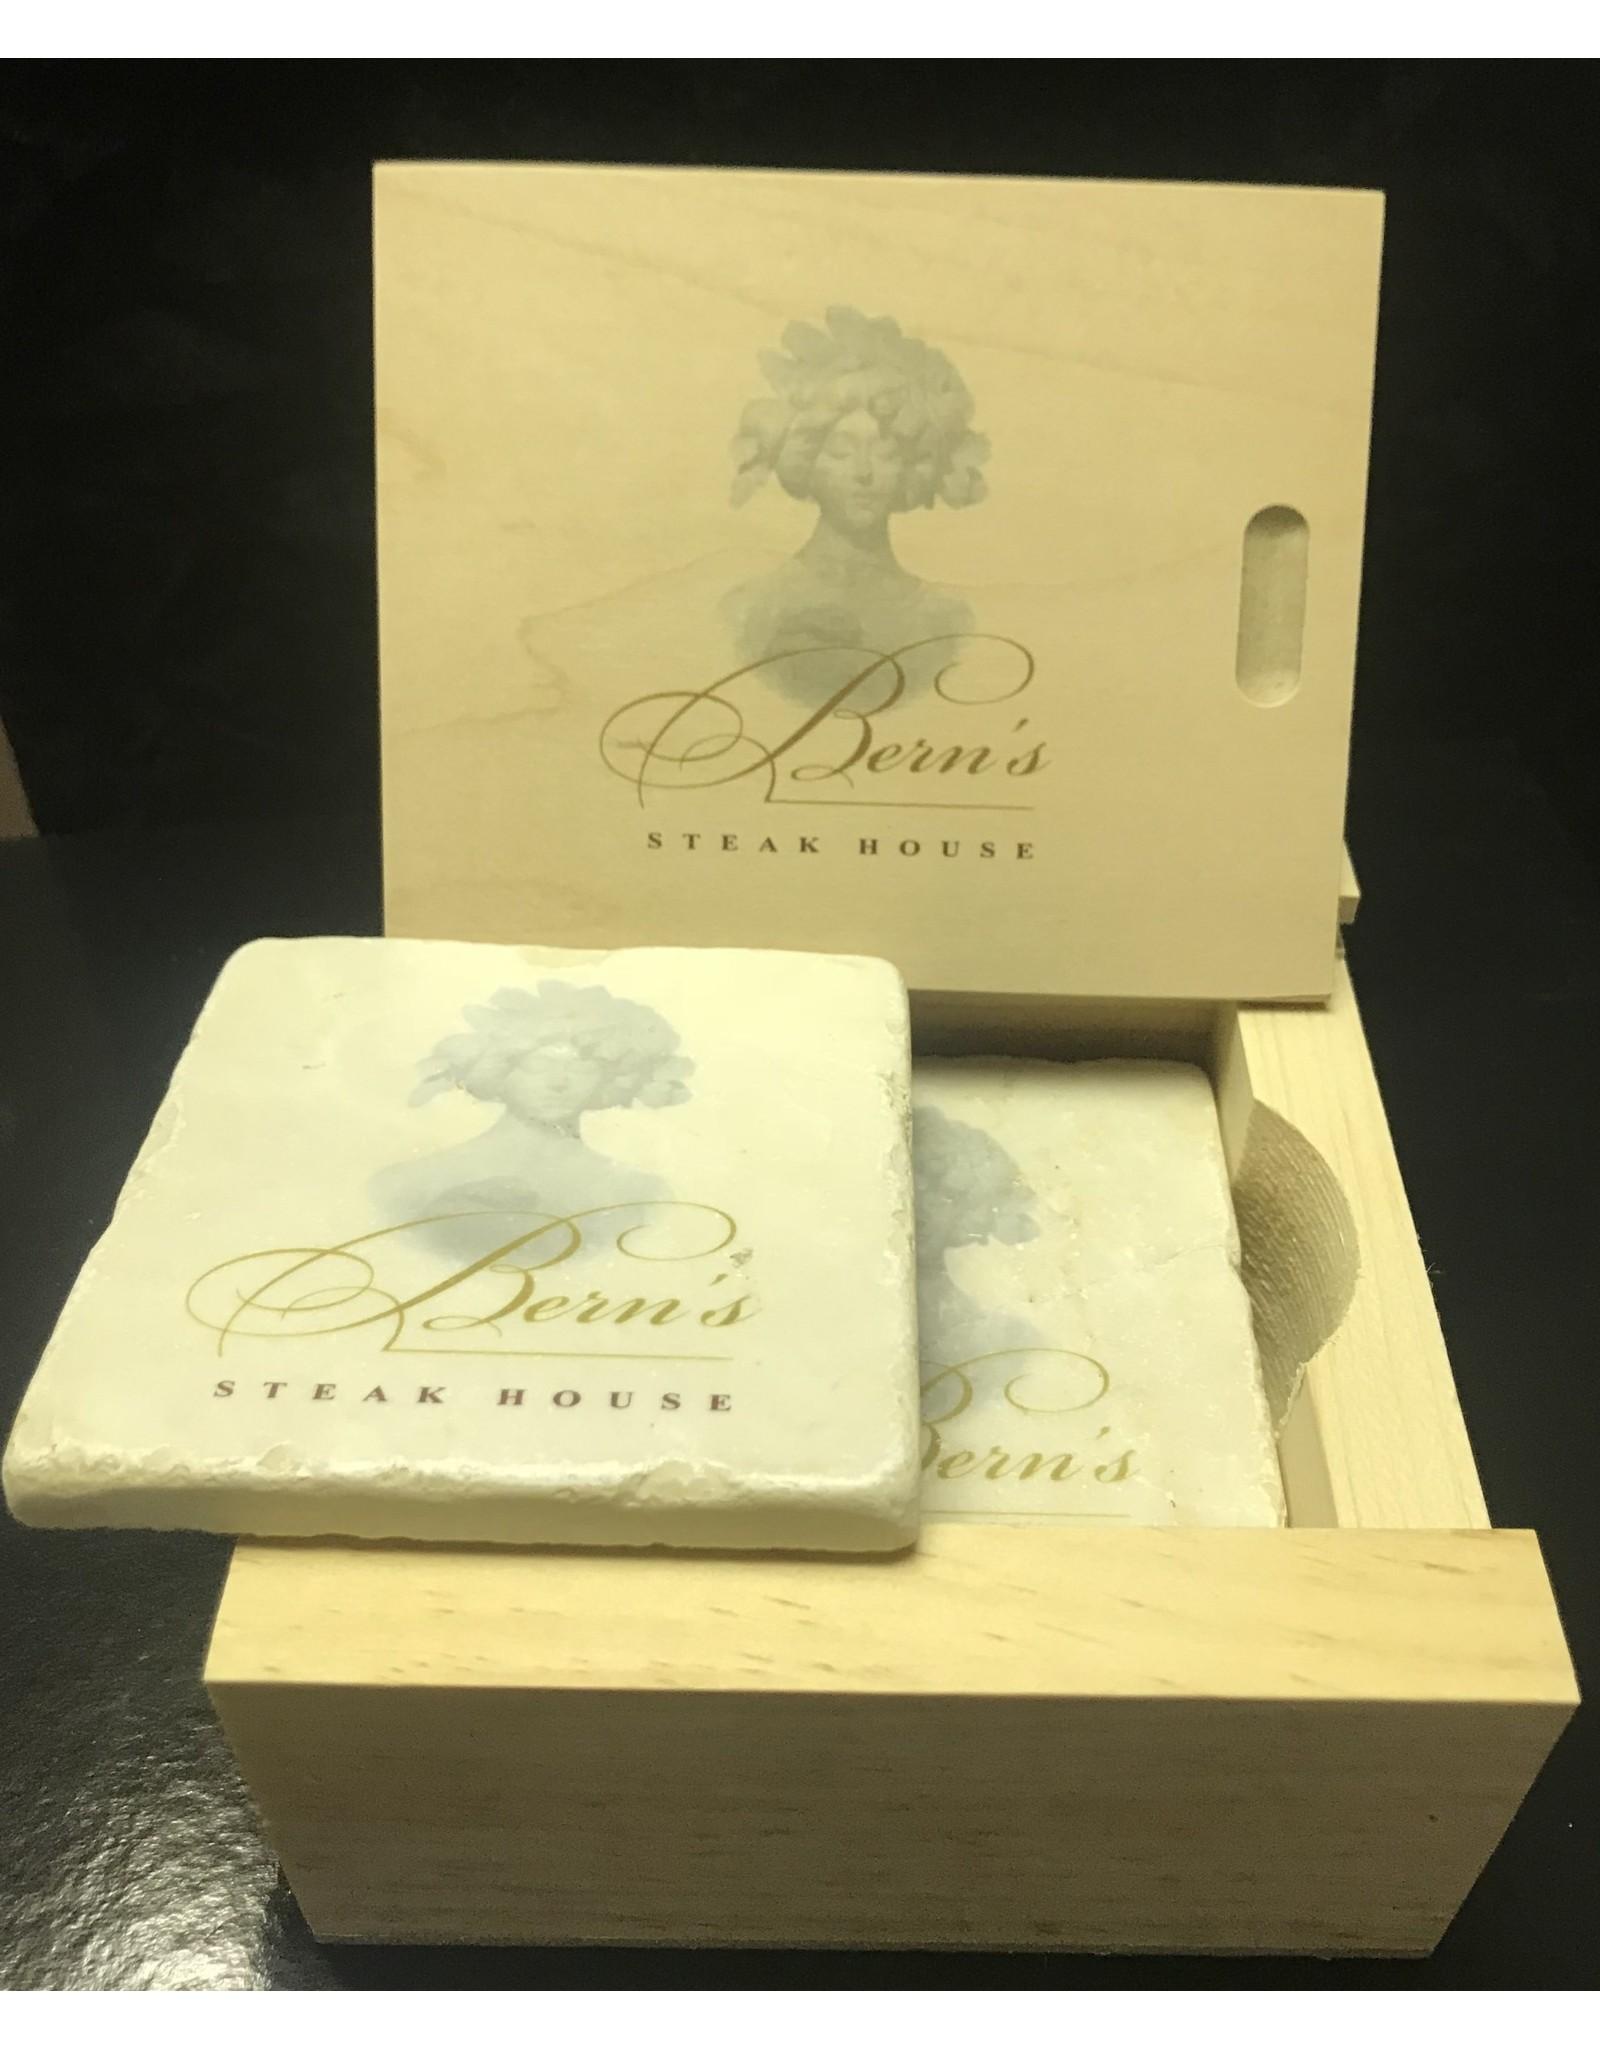 Bern's Evangeline Stone Coasters 4 pack in Wood Box